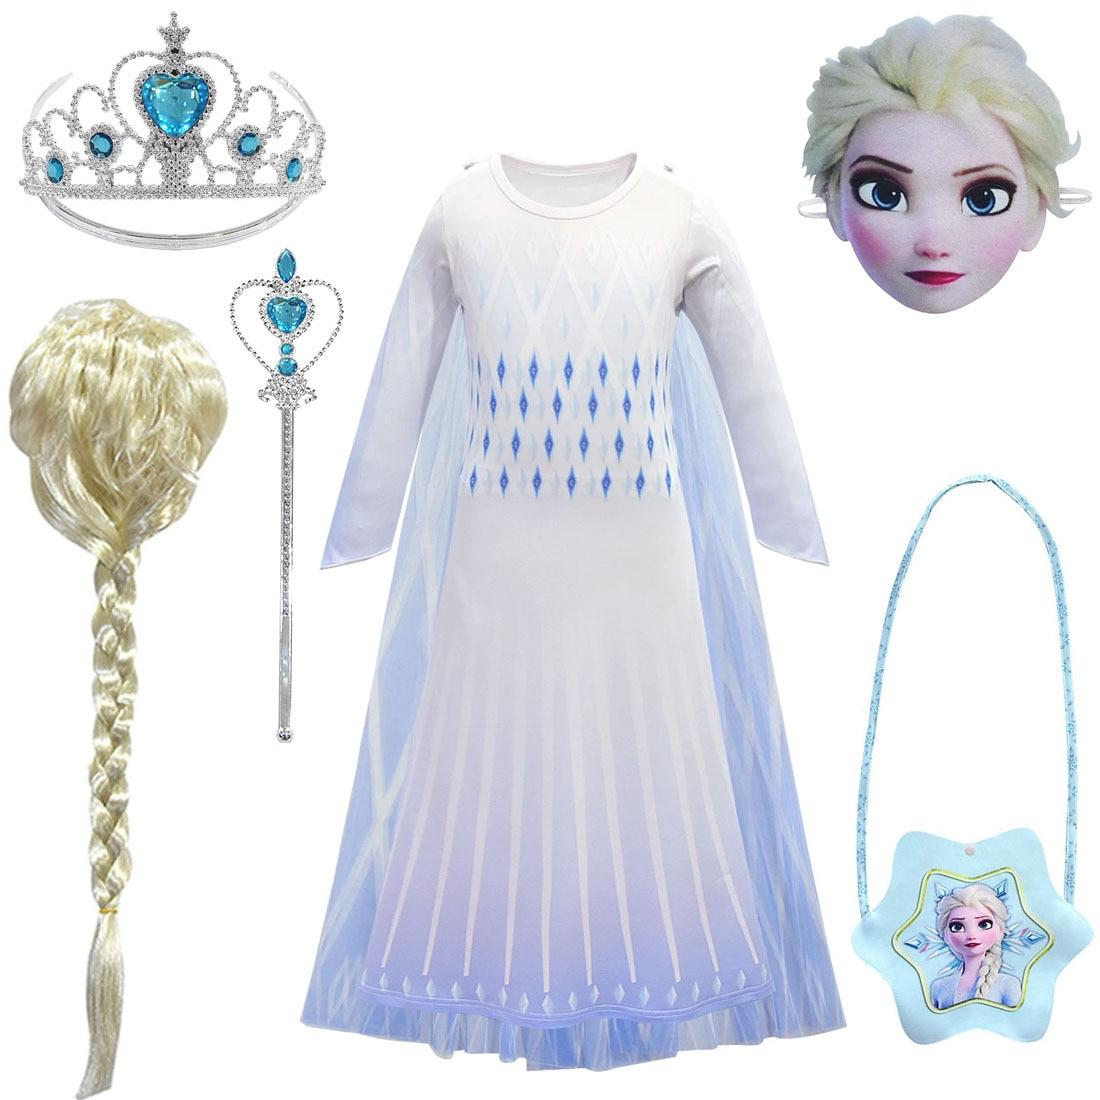 2020 Costume Frozen 2 Cosplay Elsa Anna Princess Dress Kids Dresses For Girls Chrismas Party Dresses Girls Wedding Gowns Suits